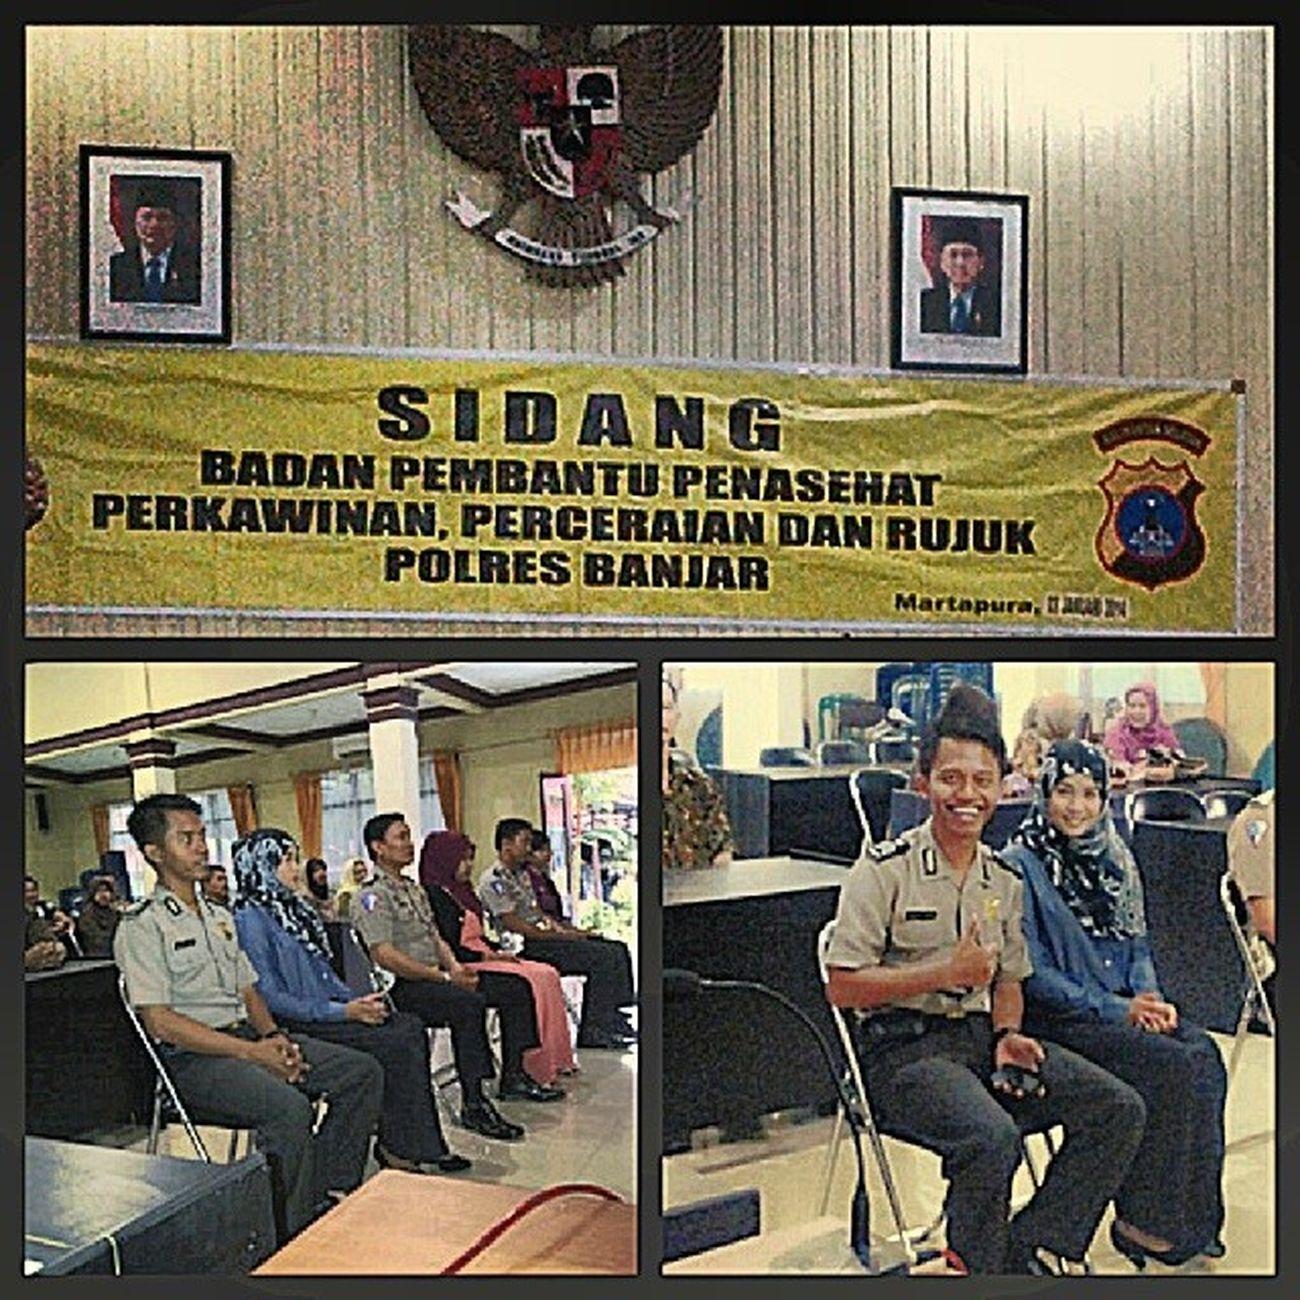 Sidang pernikahan at Polres Banjar w/ my future husband @harryanton Instalike Instawedding Instabanjar Instabungas instadaily